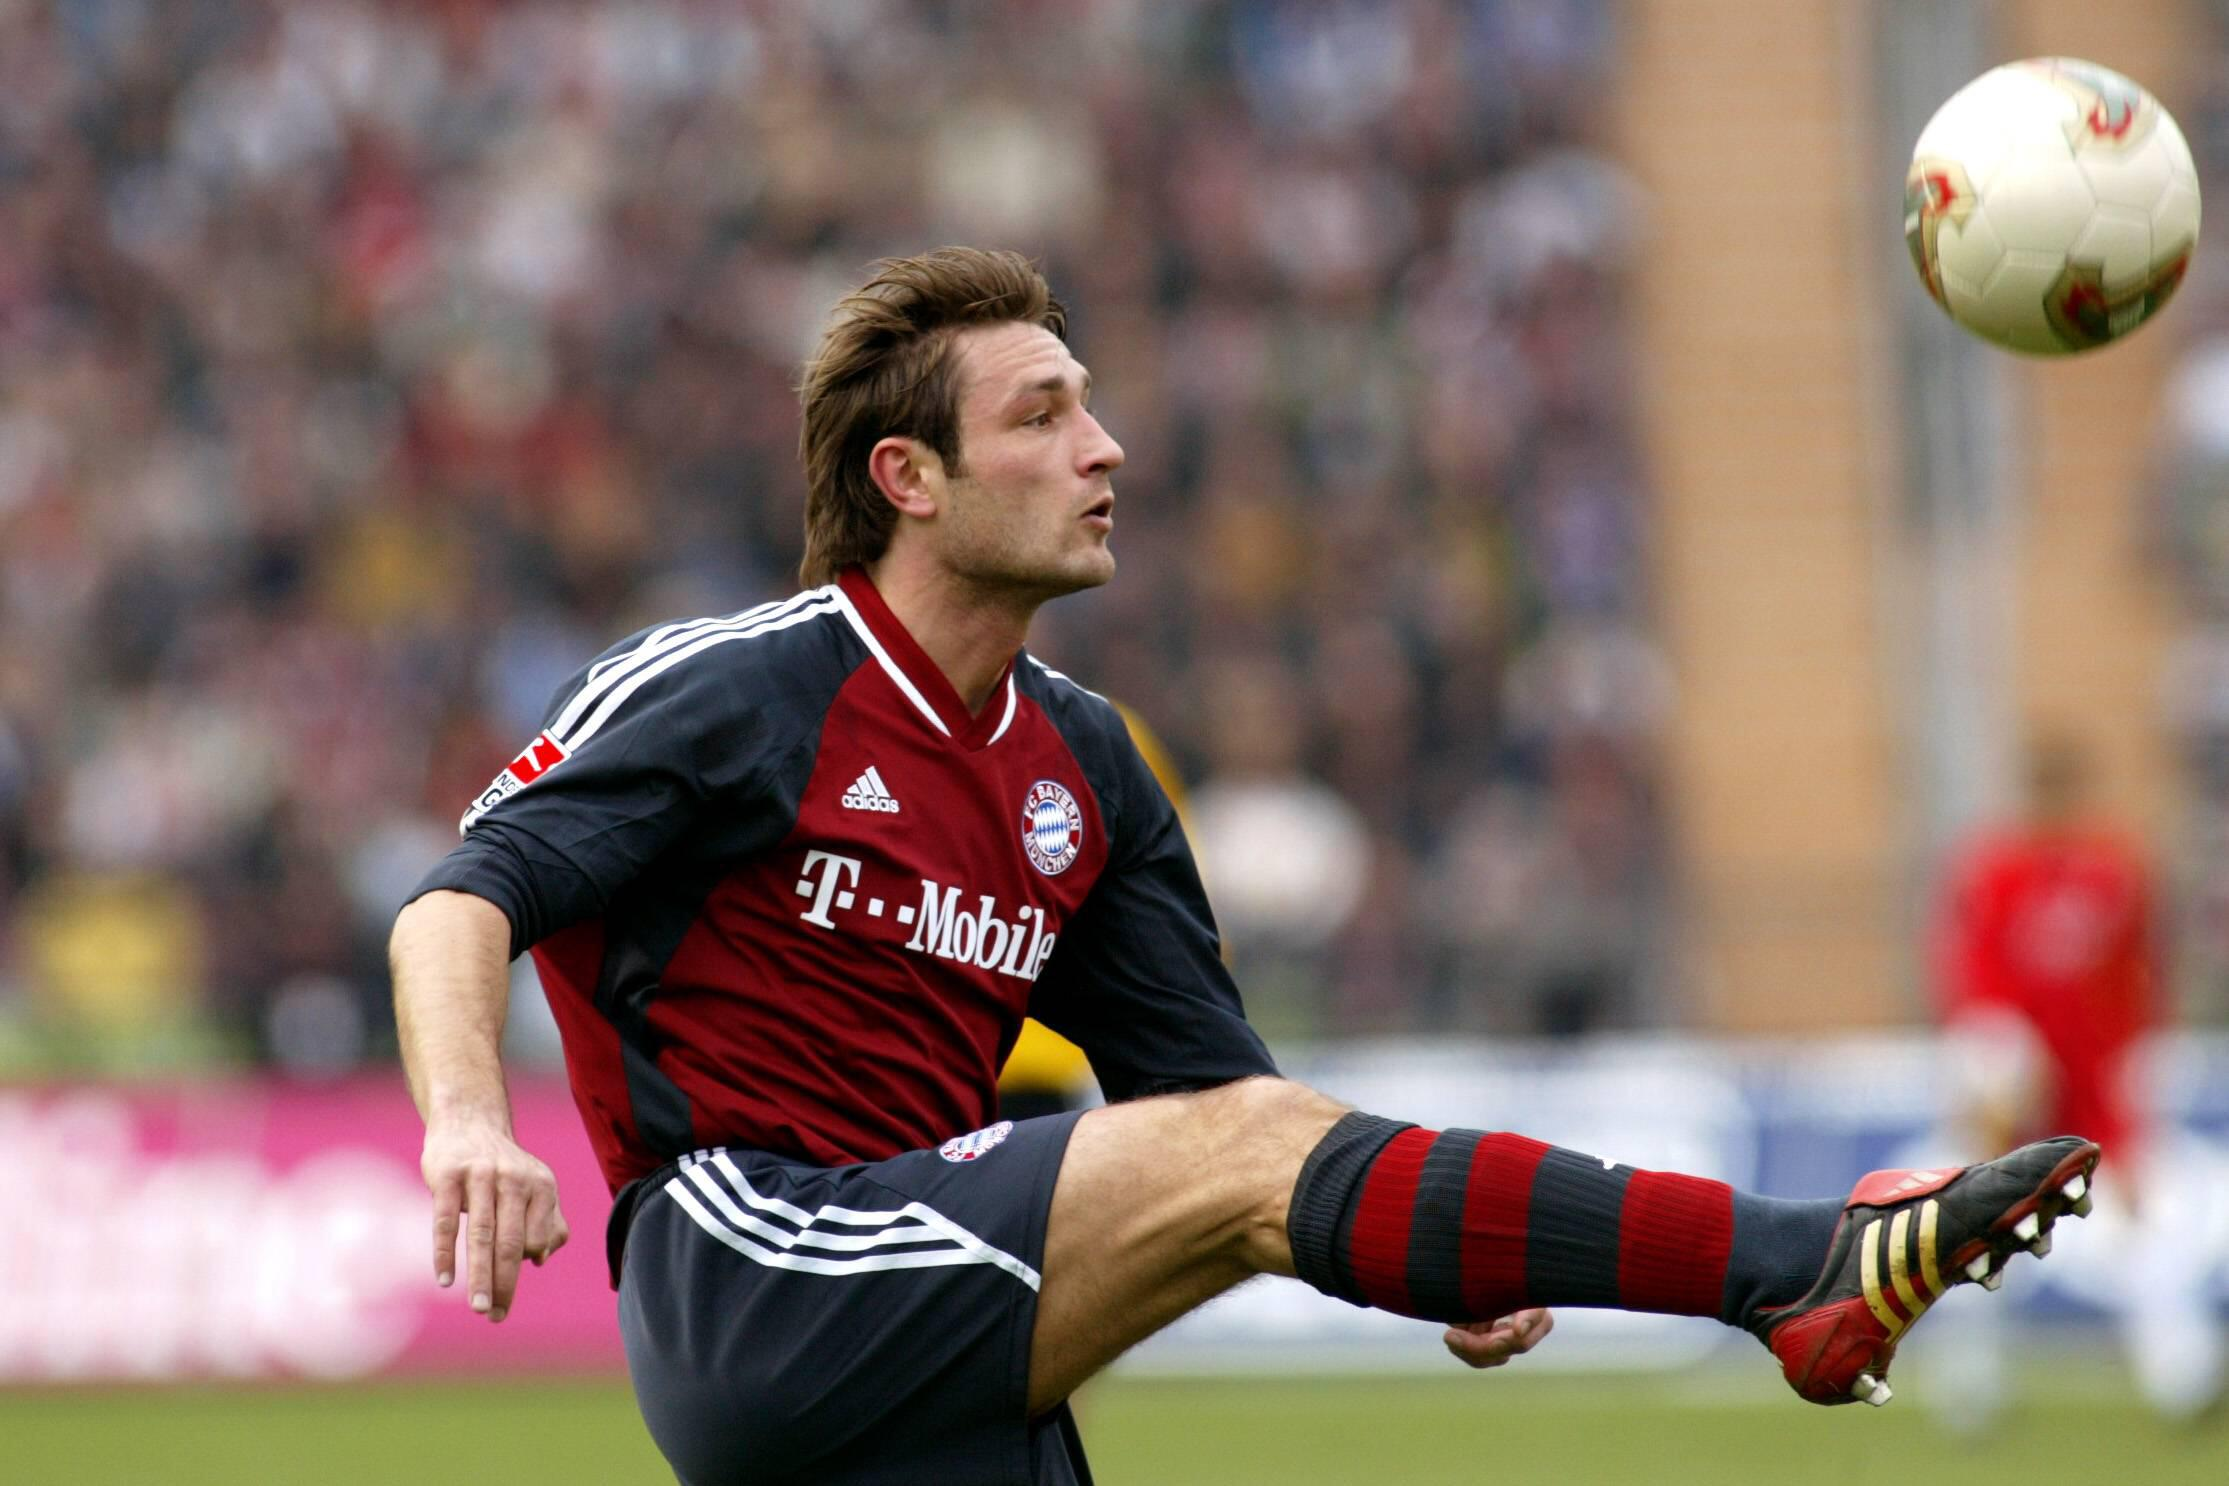 Bild zu Robert Kovac, FC Bayern München, Bundesliga, 2002/03